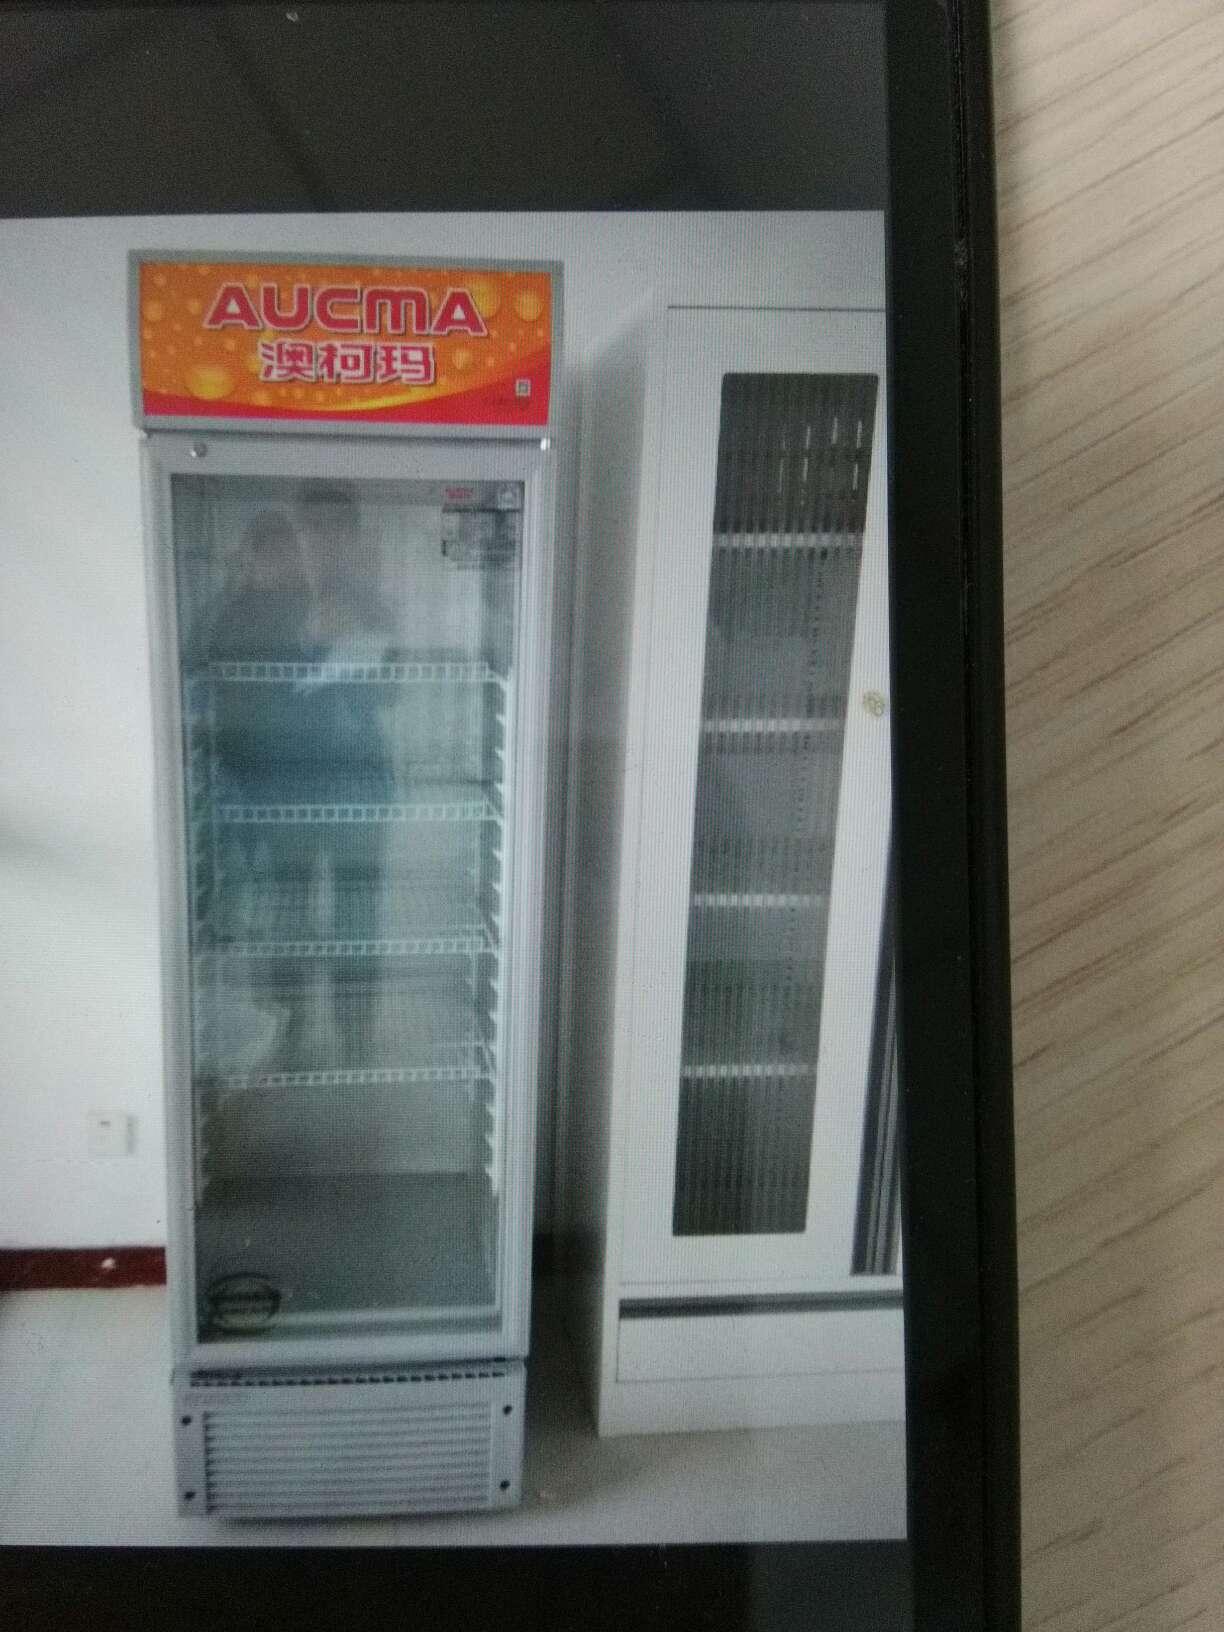 buy asics canada 009101758 bags